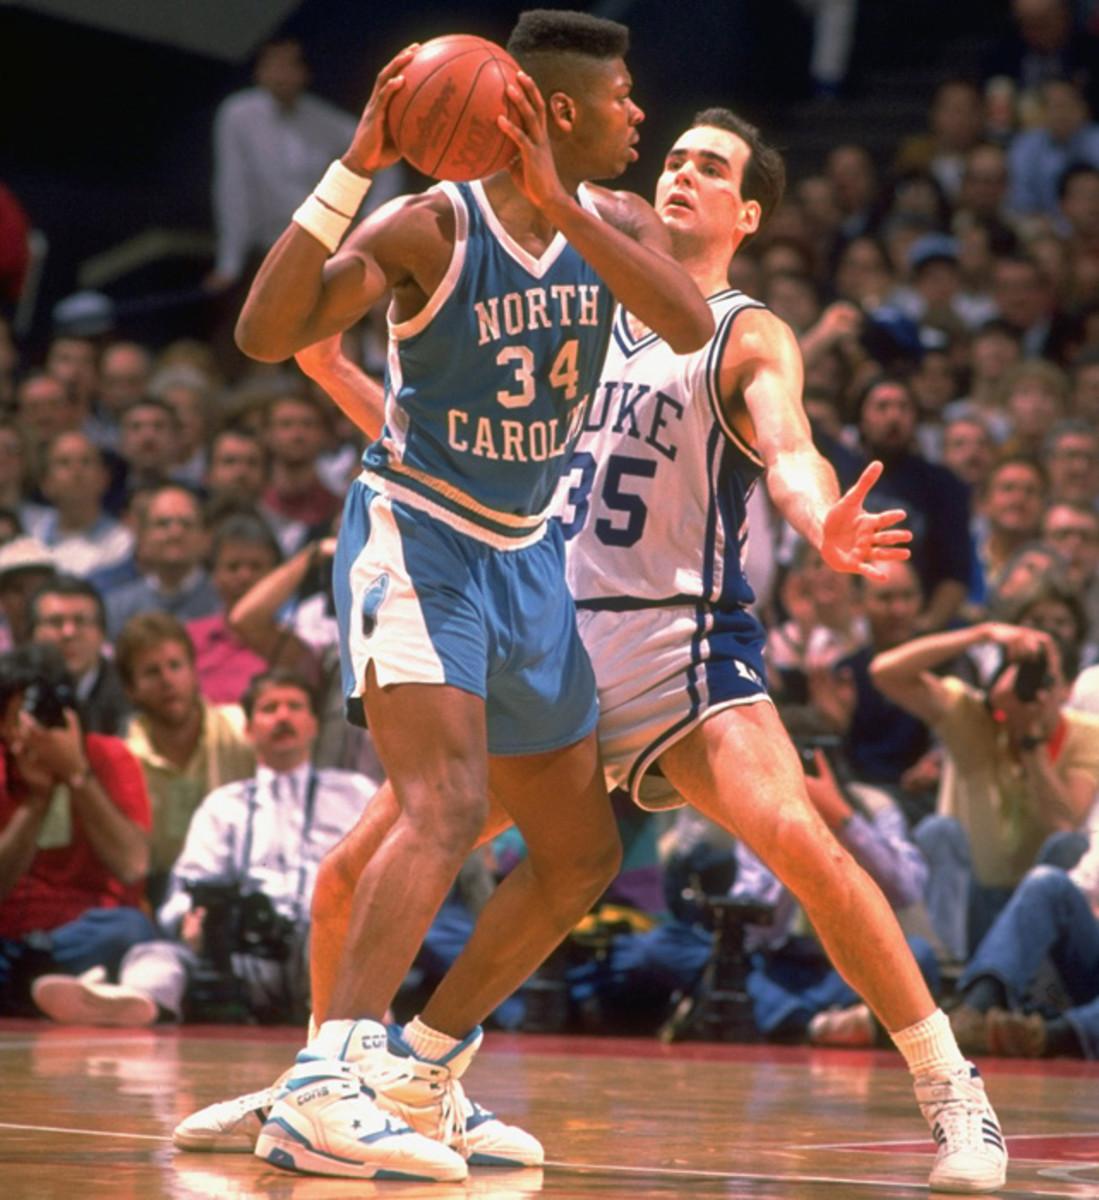 North Carolina vs. Duke